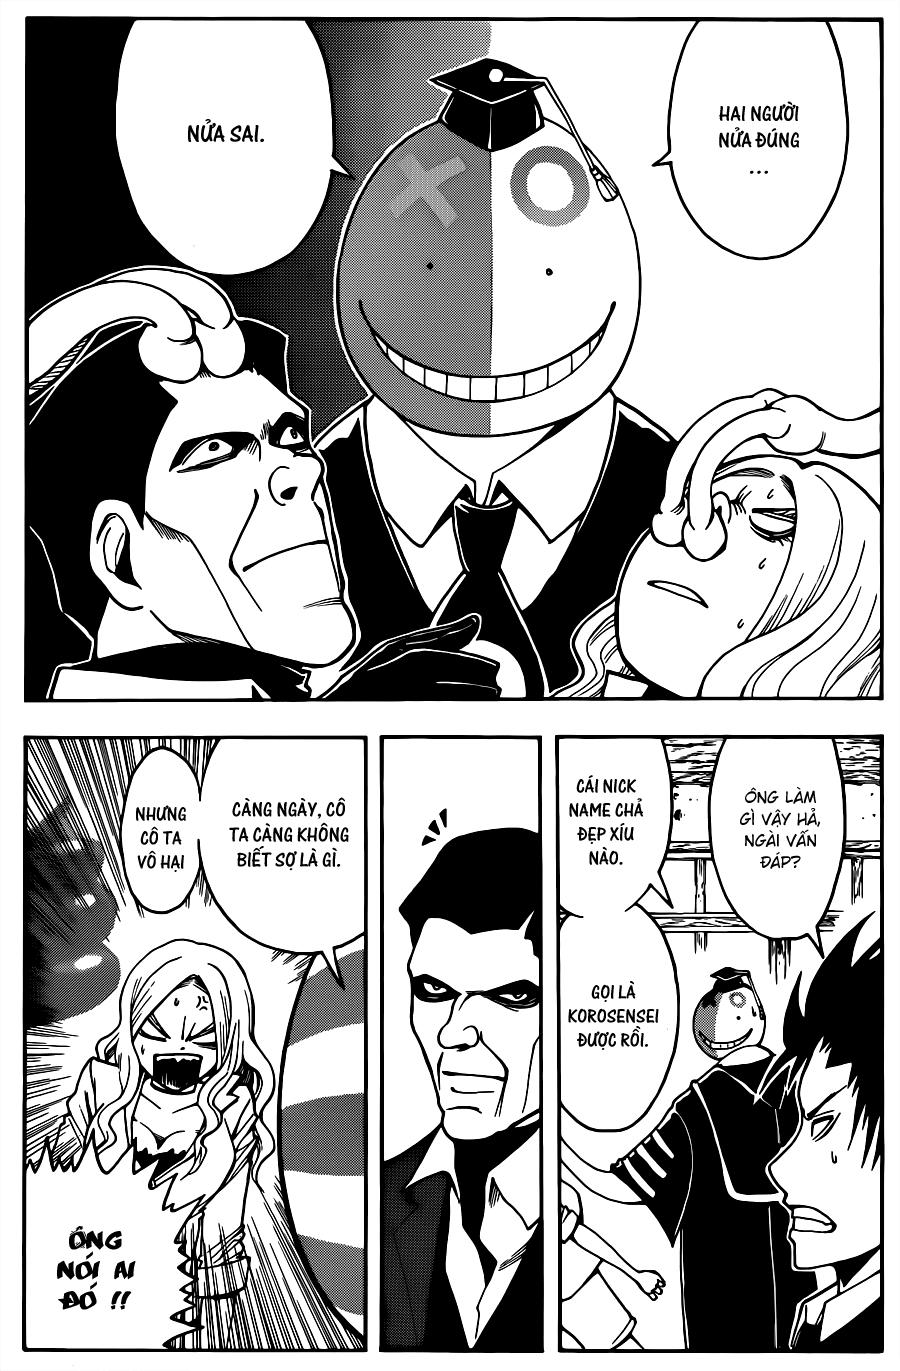 Ansatsu Kyoushitsu chap 25 trang 19